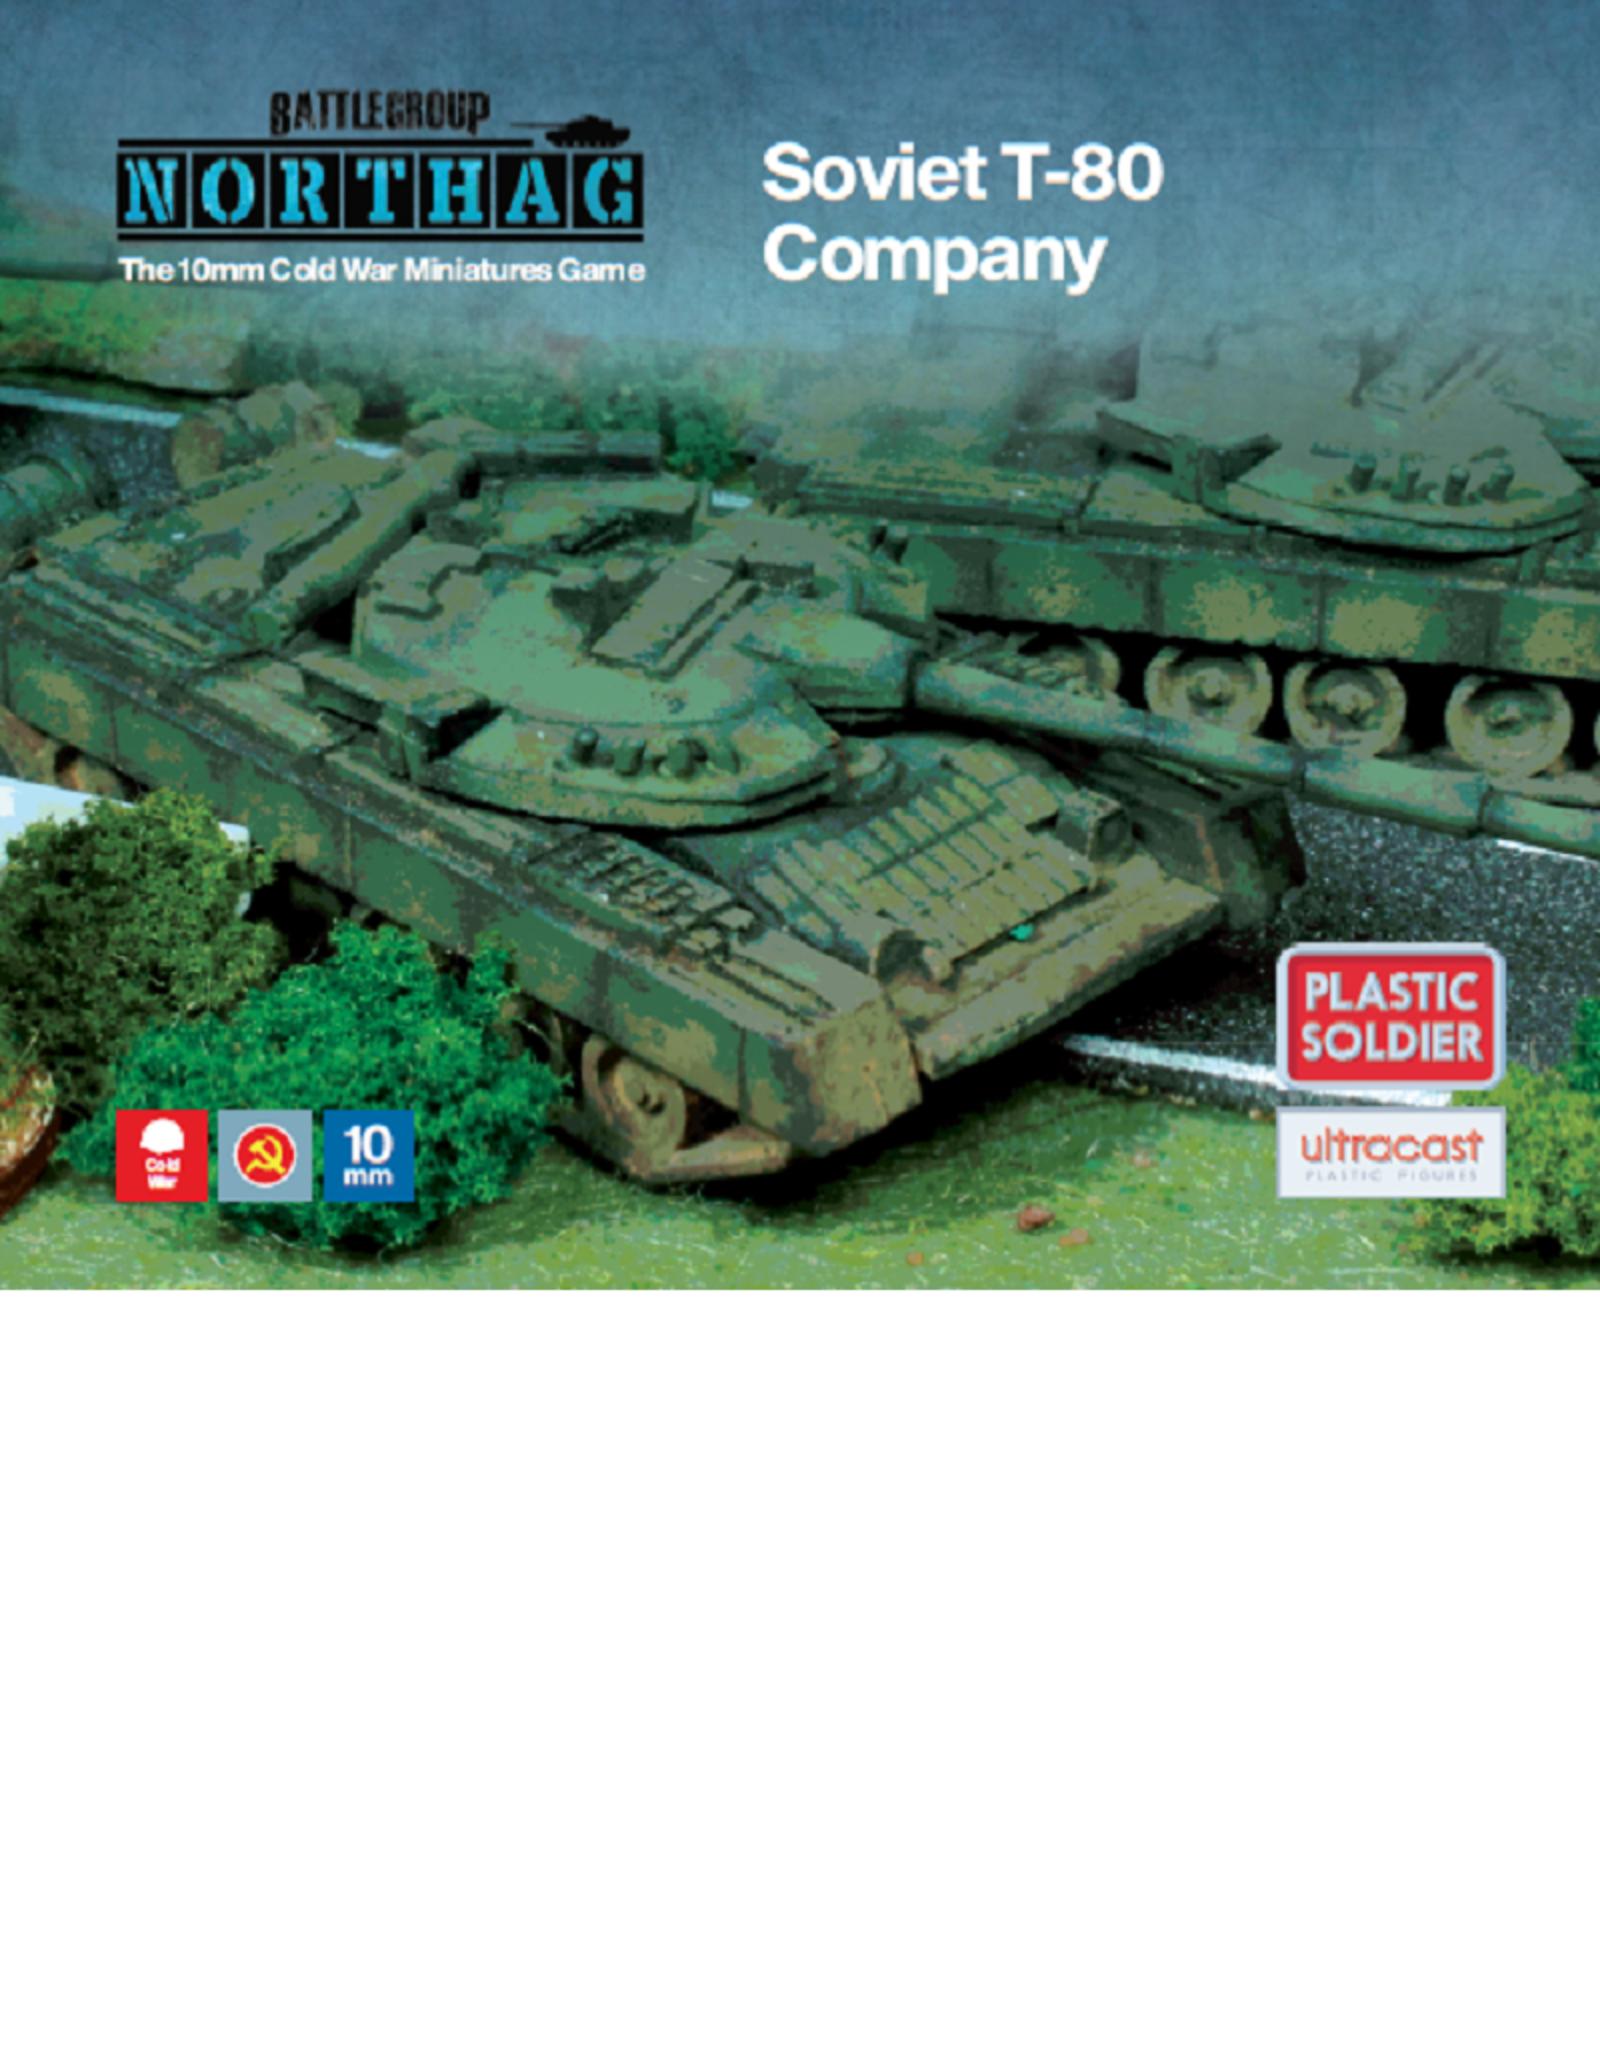 Plastic Soldier Company Soviet T-80 Company